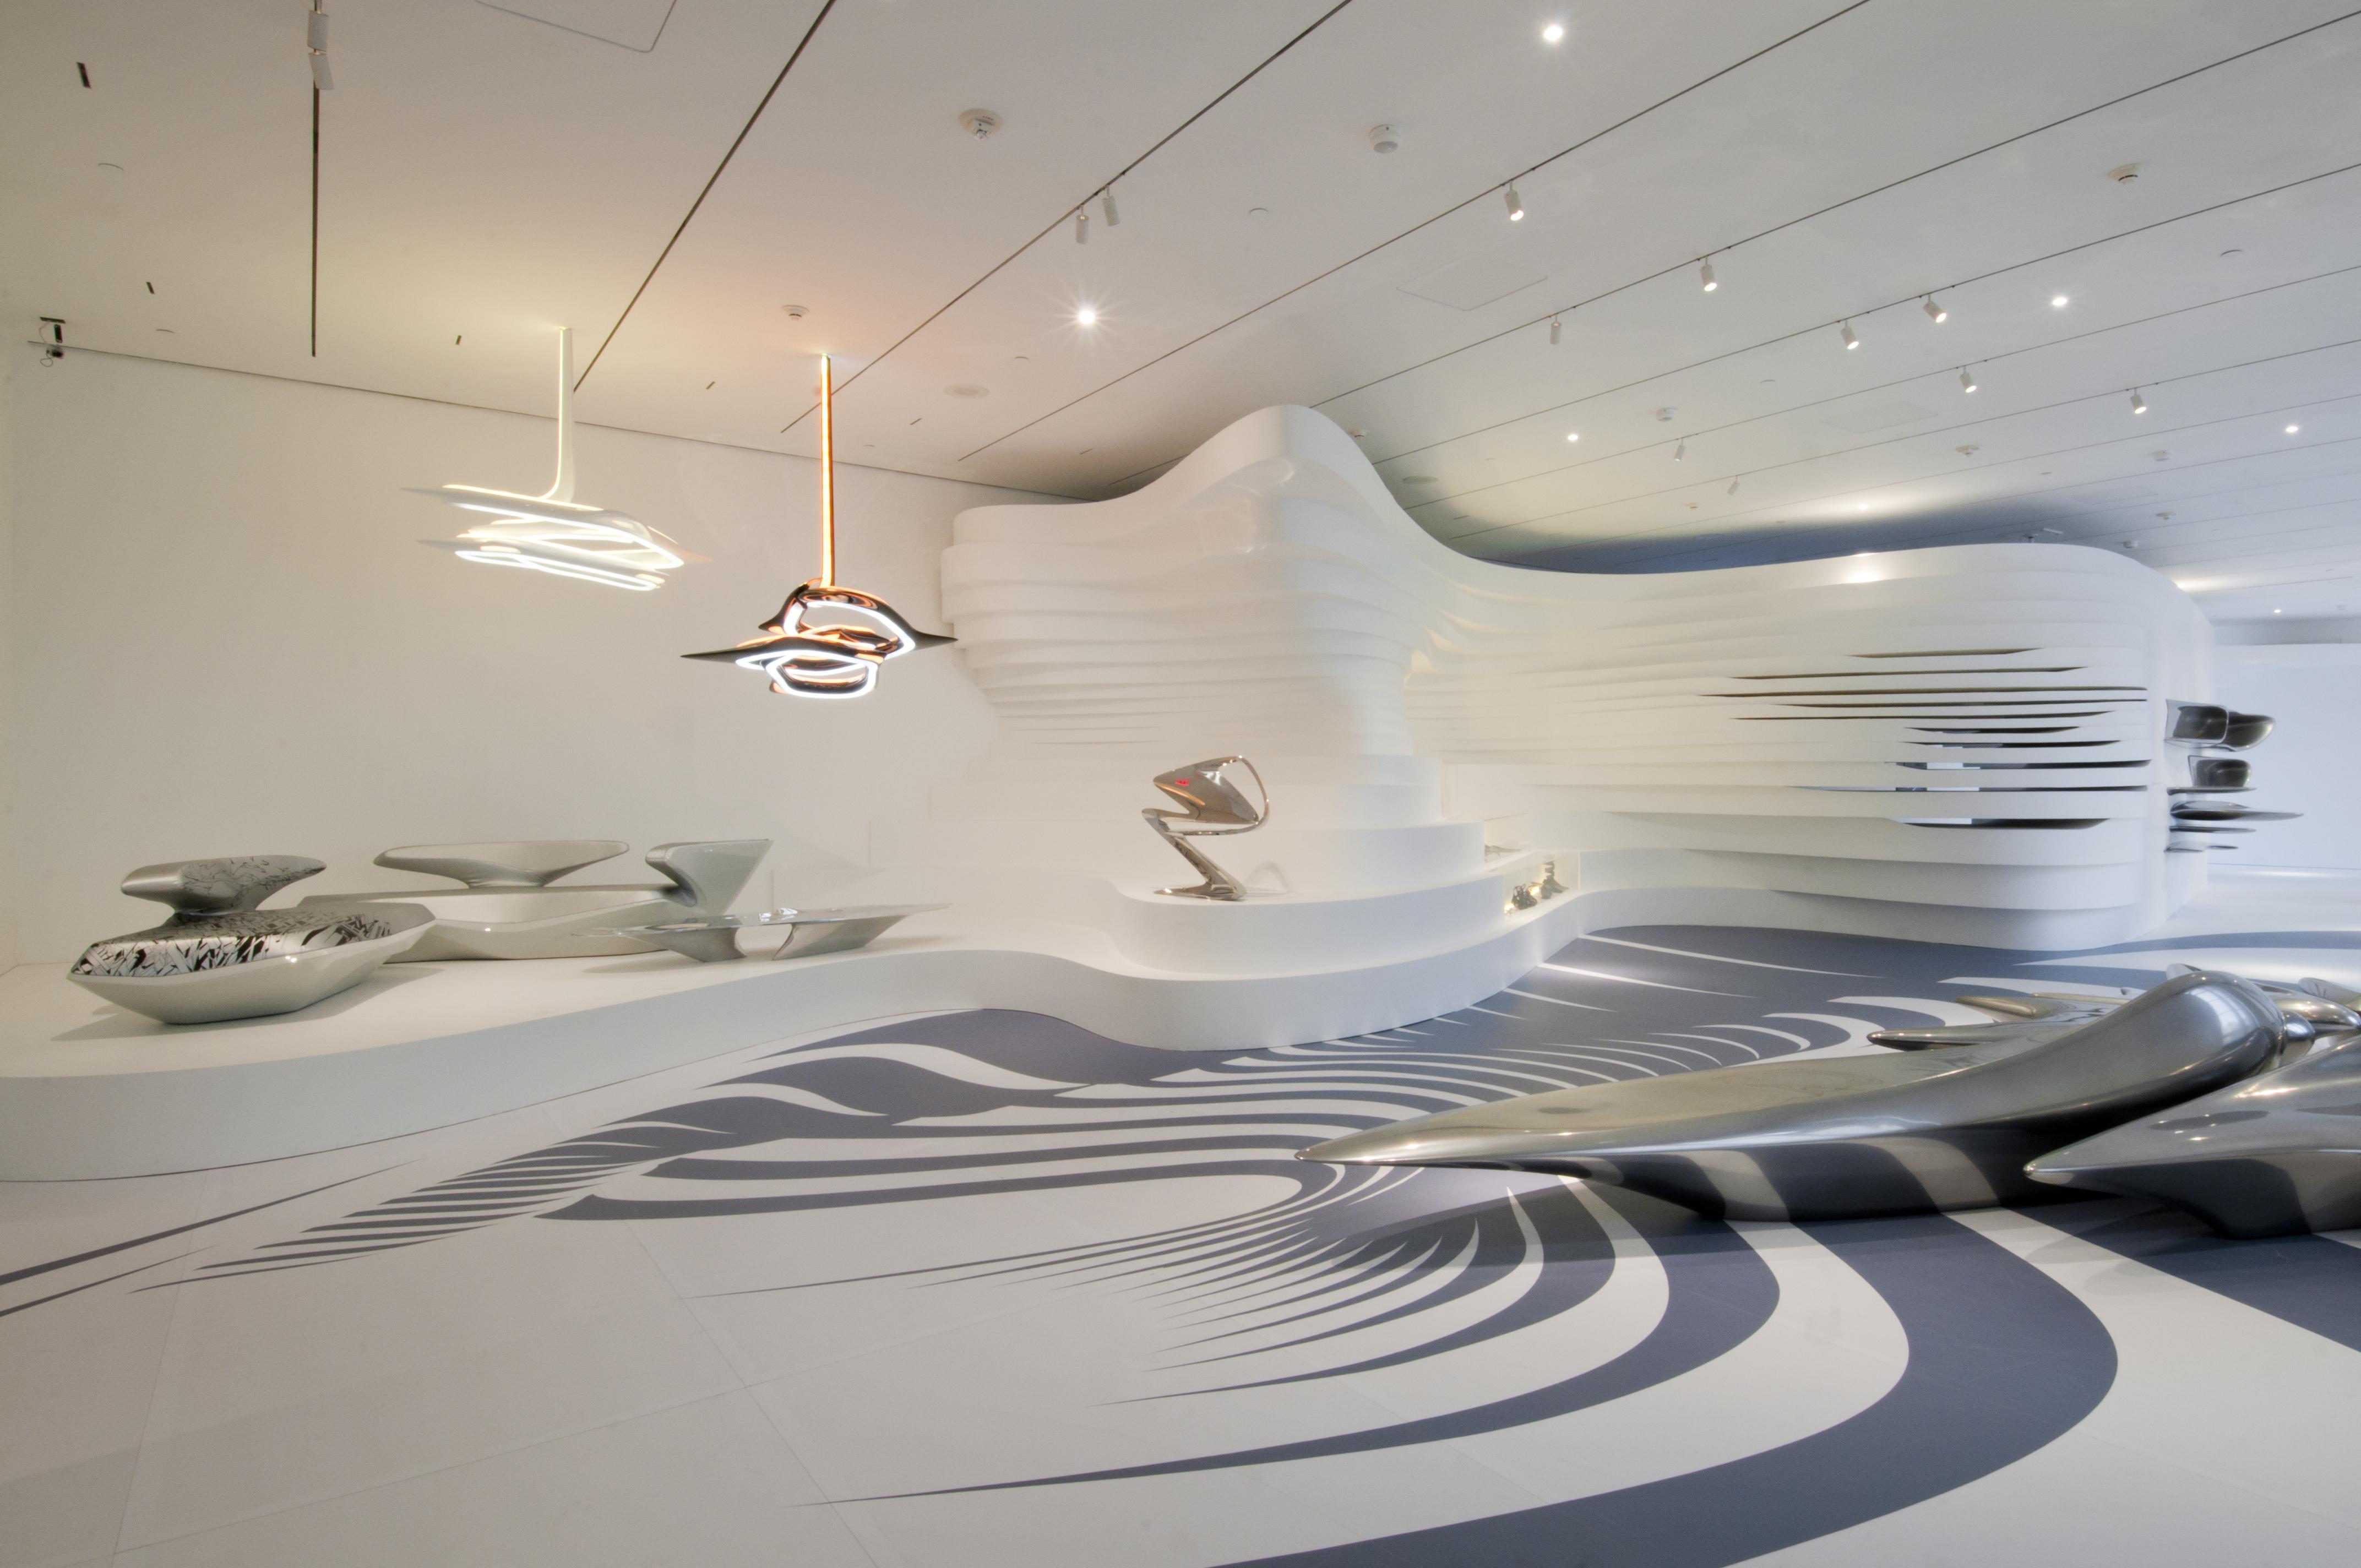 Future Architecture Zaha Hadid Futuristic Interior Zaha